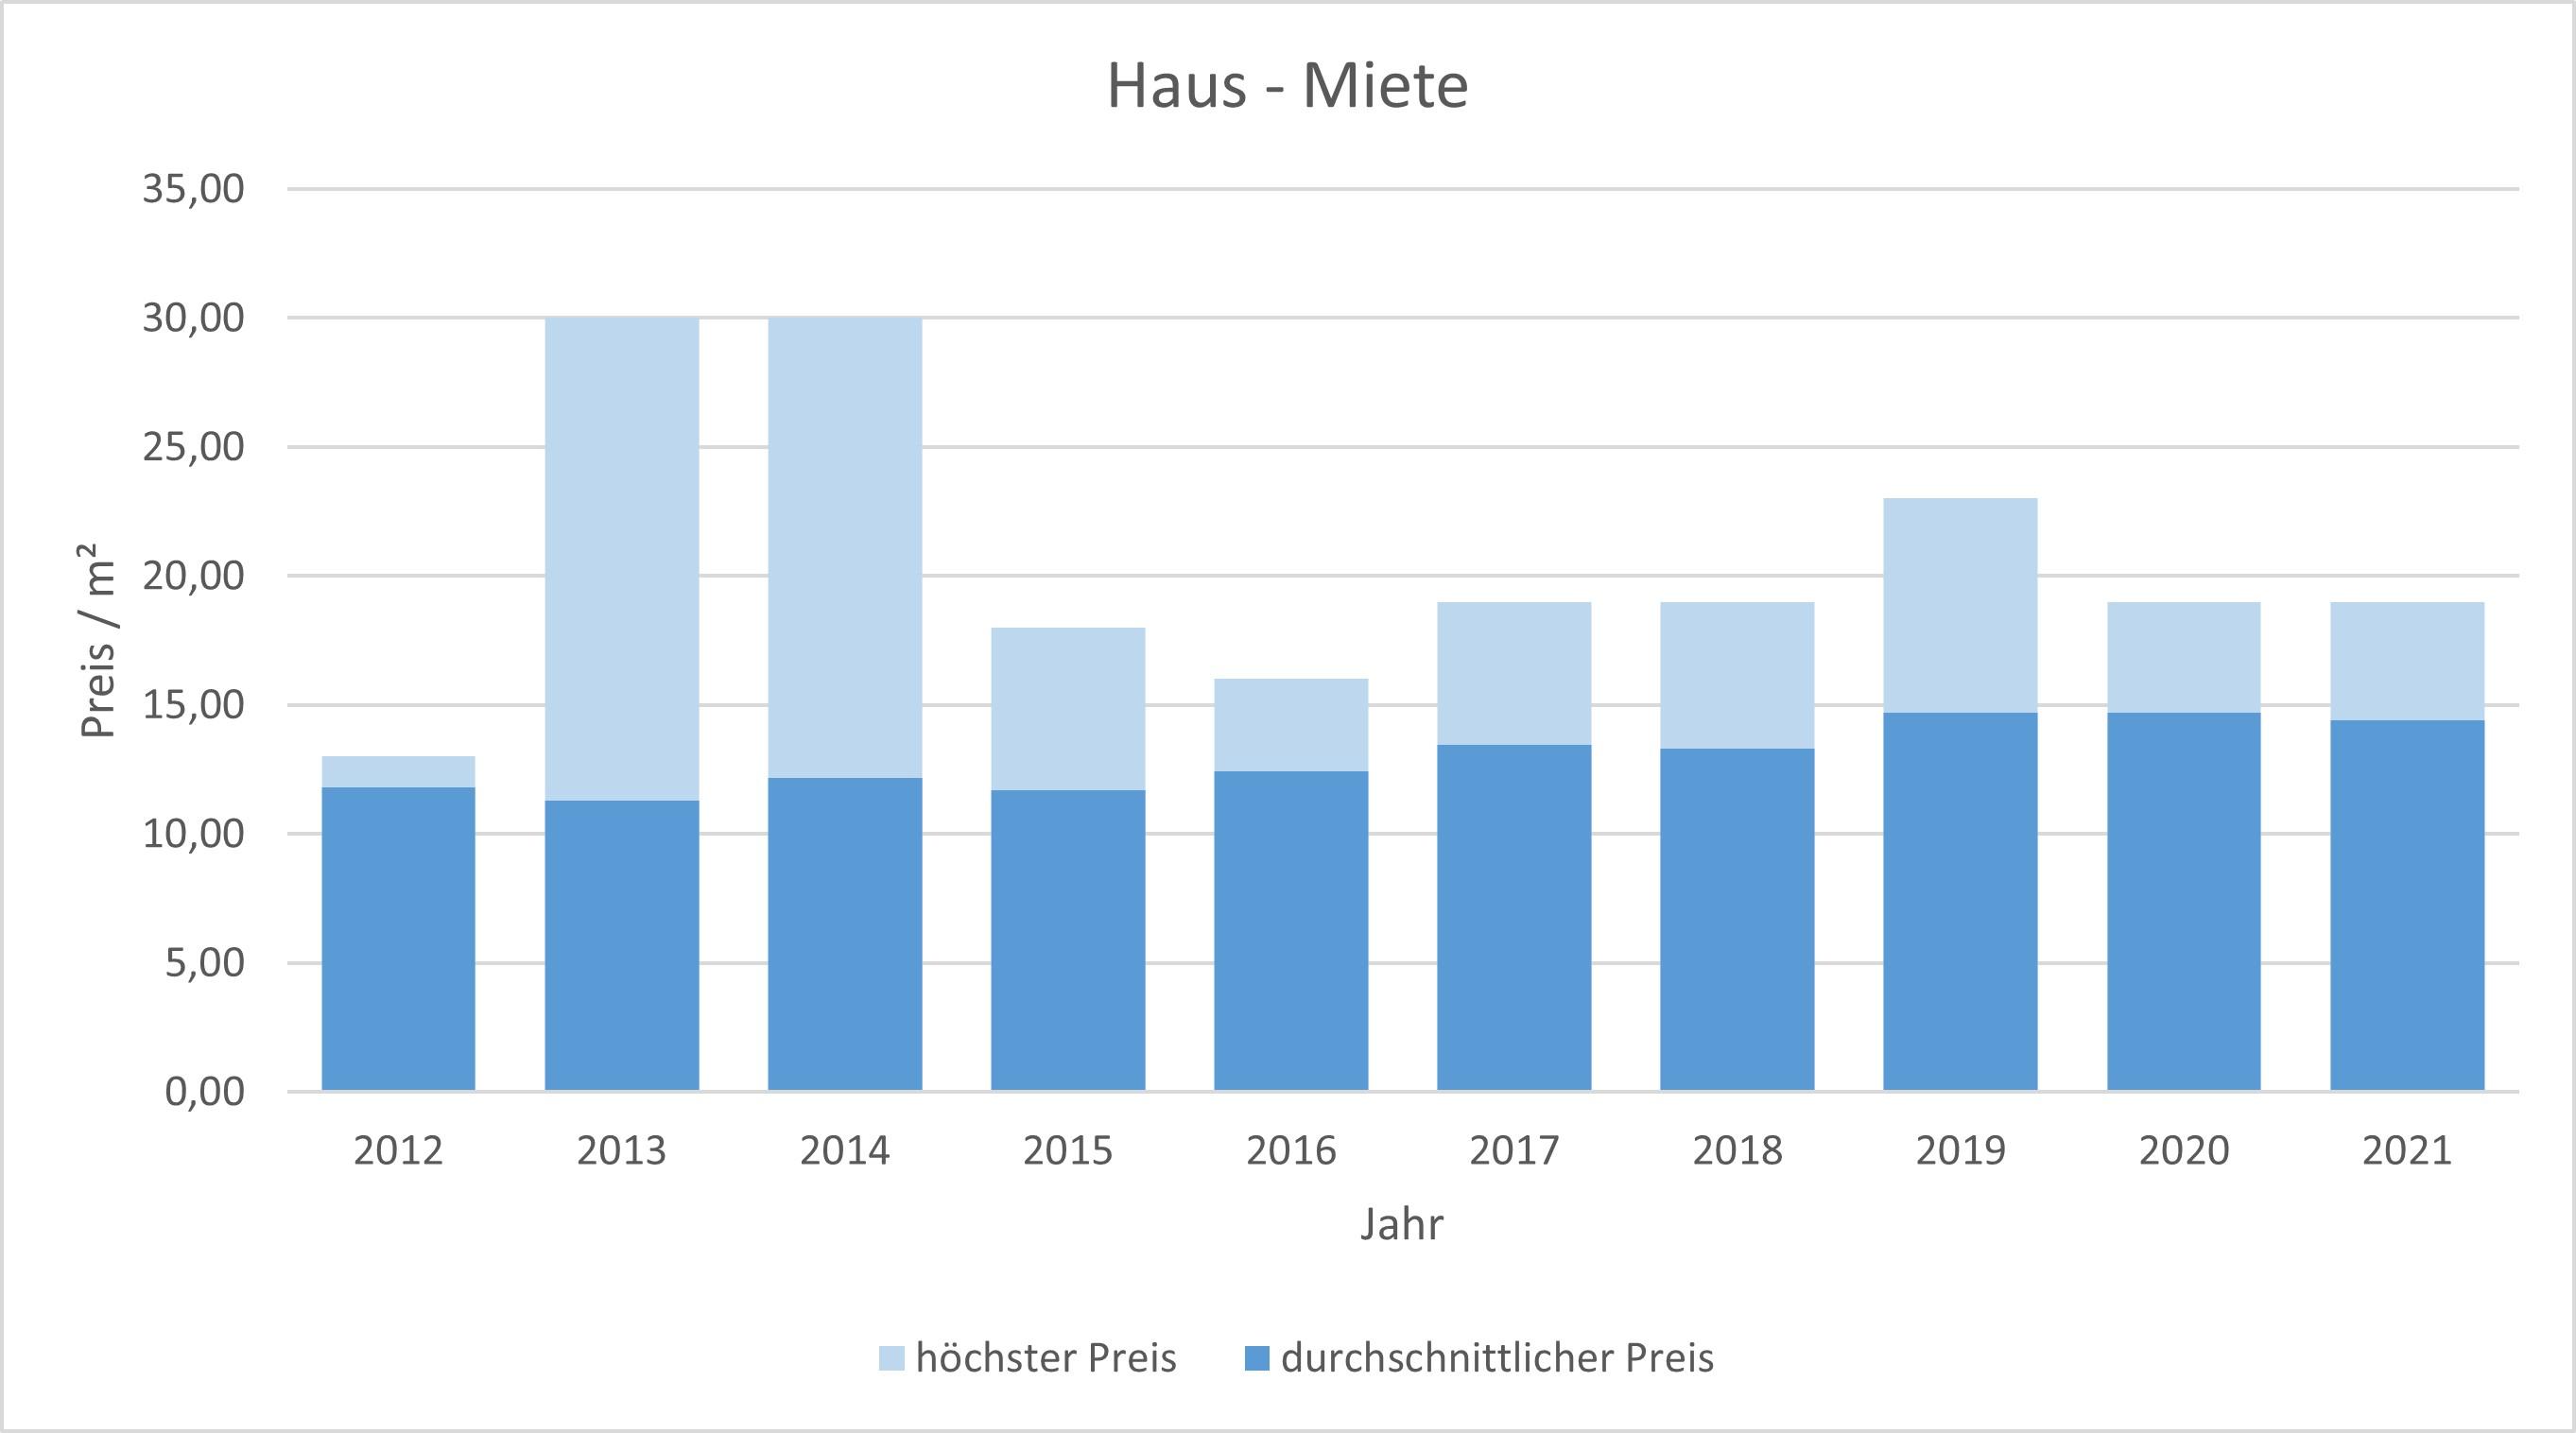 Grasbrunn Haus mieten vermieten Preis Bewertung Makler www.happy-immo.de 2019 2020 2021